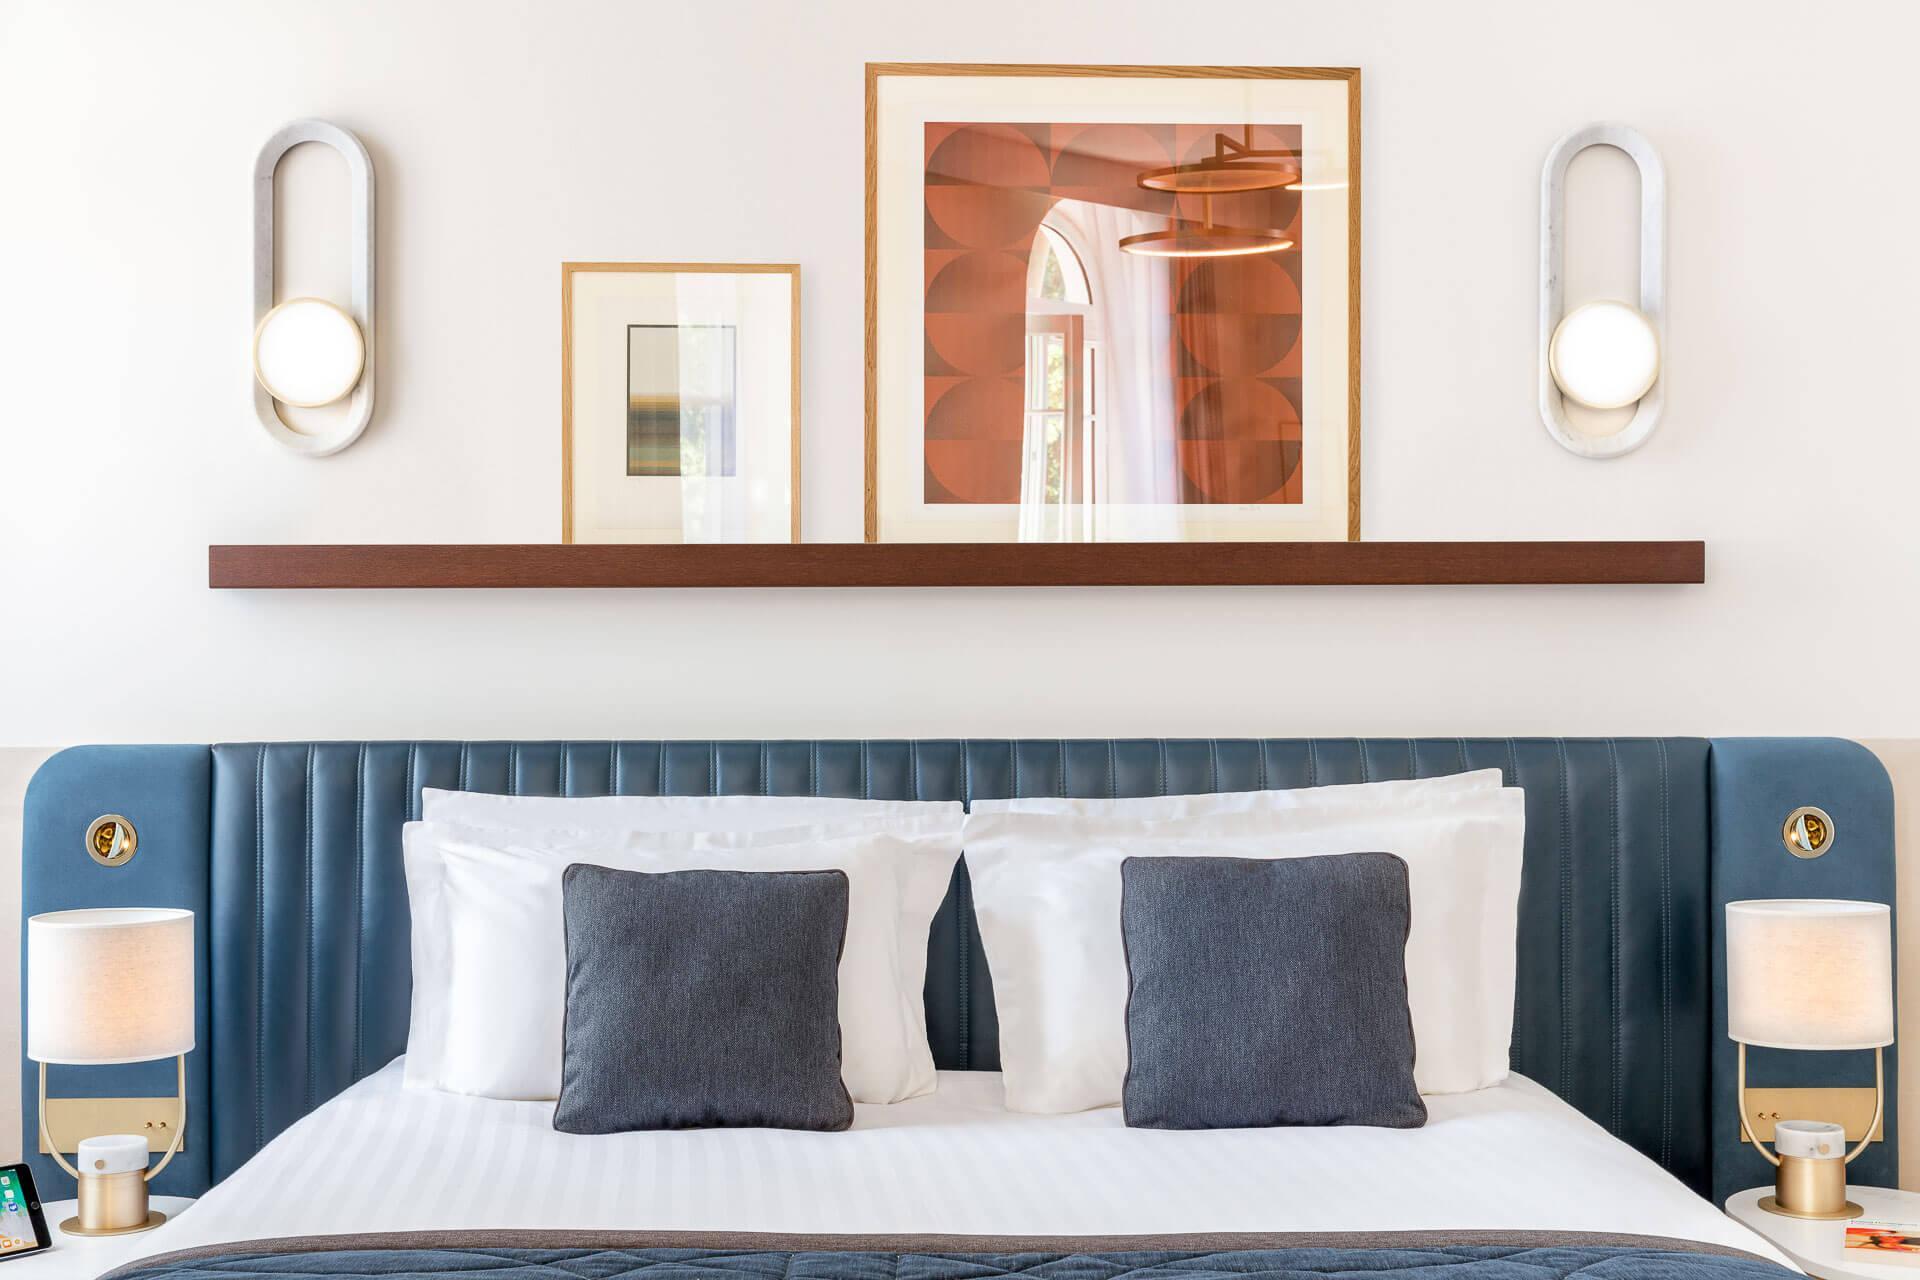 Maison Albar Hotels L'Imperator - executive © Stefan Kraus